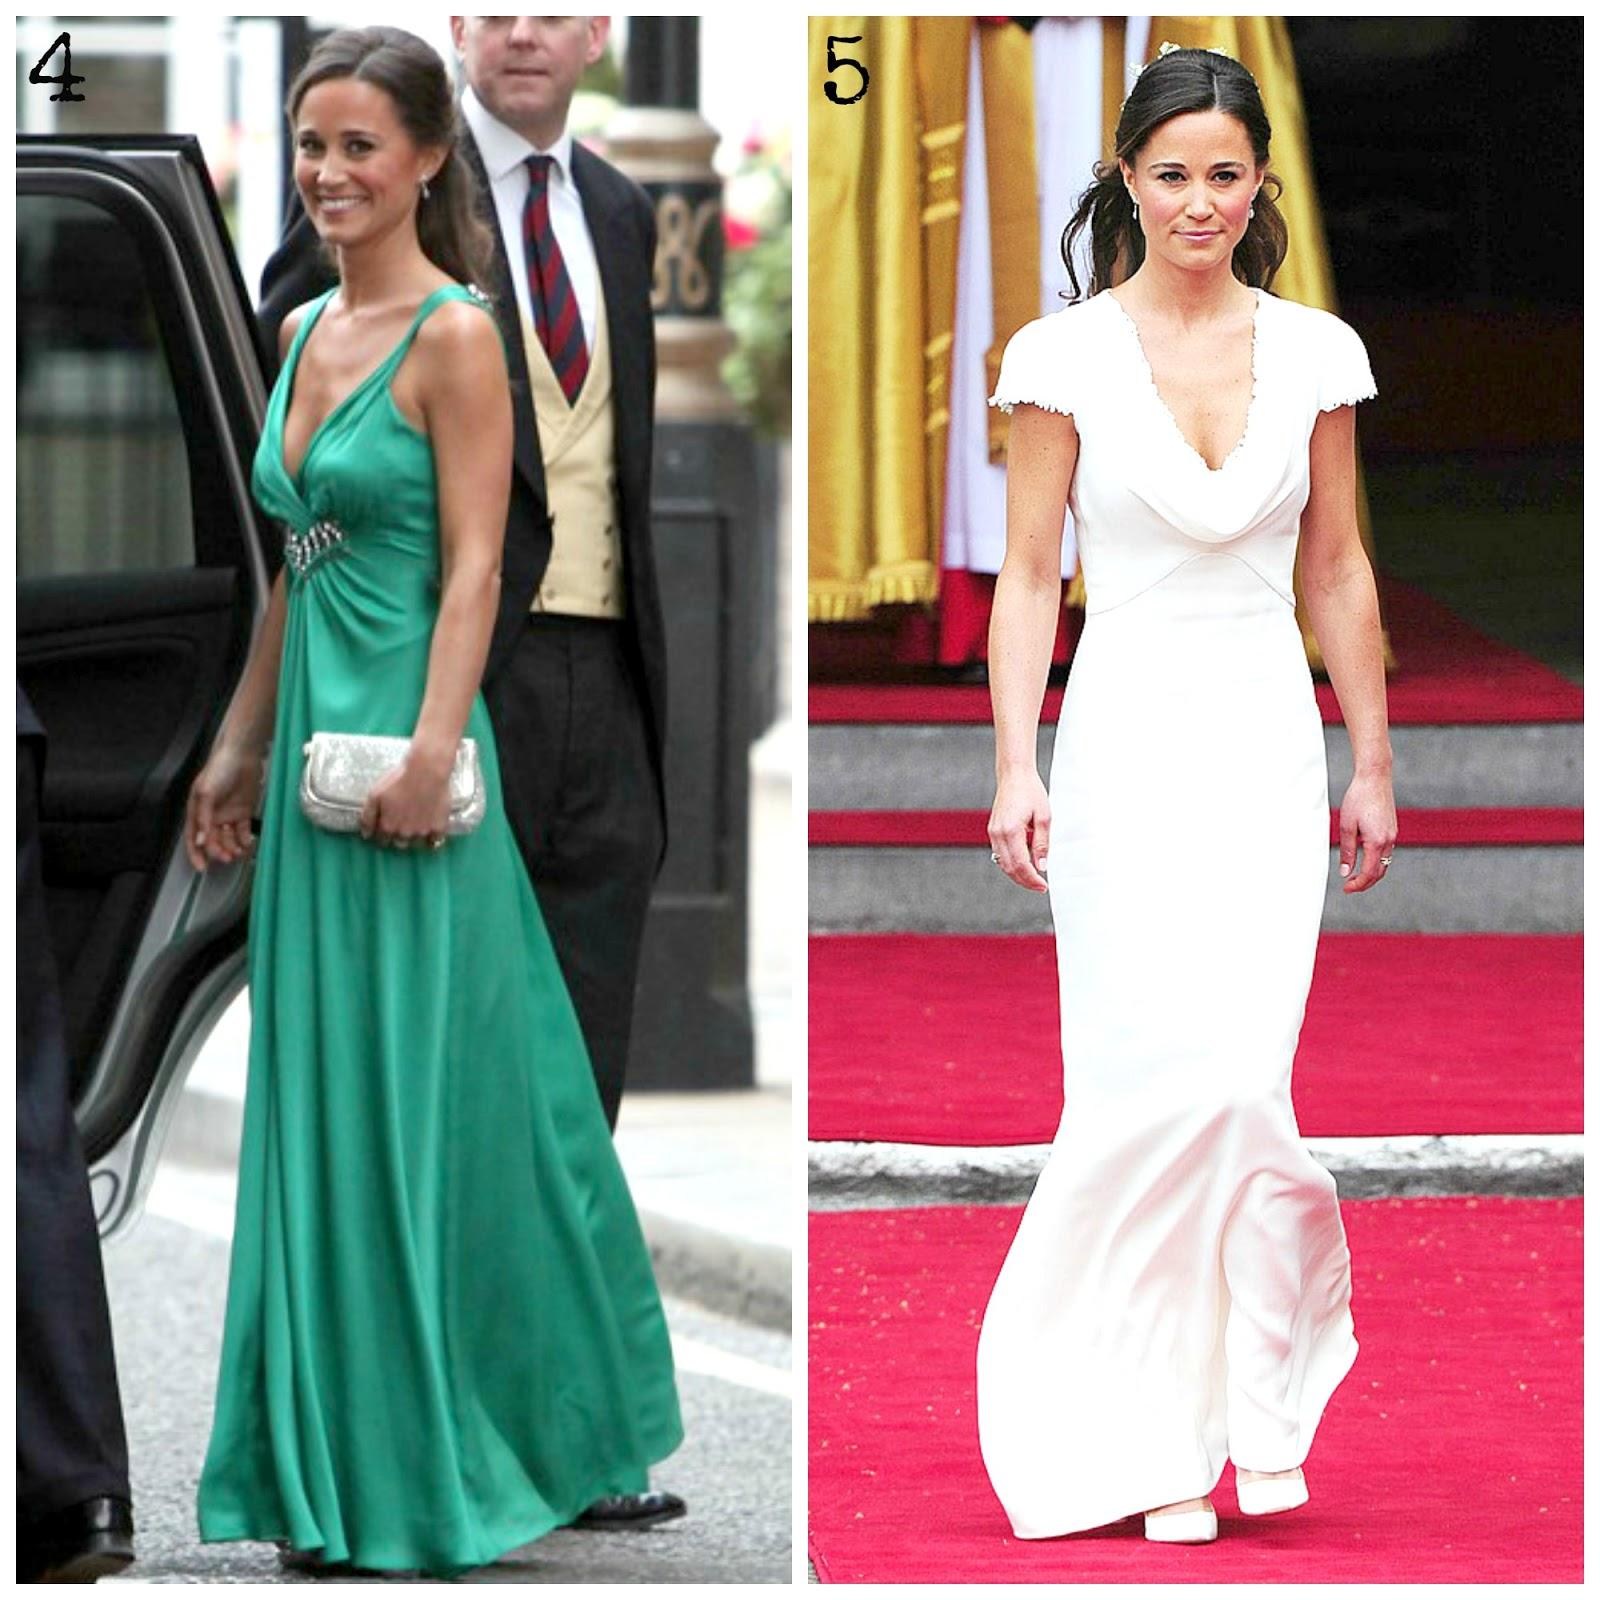 At The Royal Wedding Pippa Middleton S Dress: Pippa Middleton: Princess Of Style